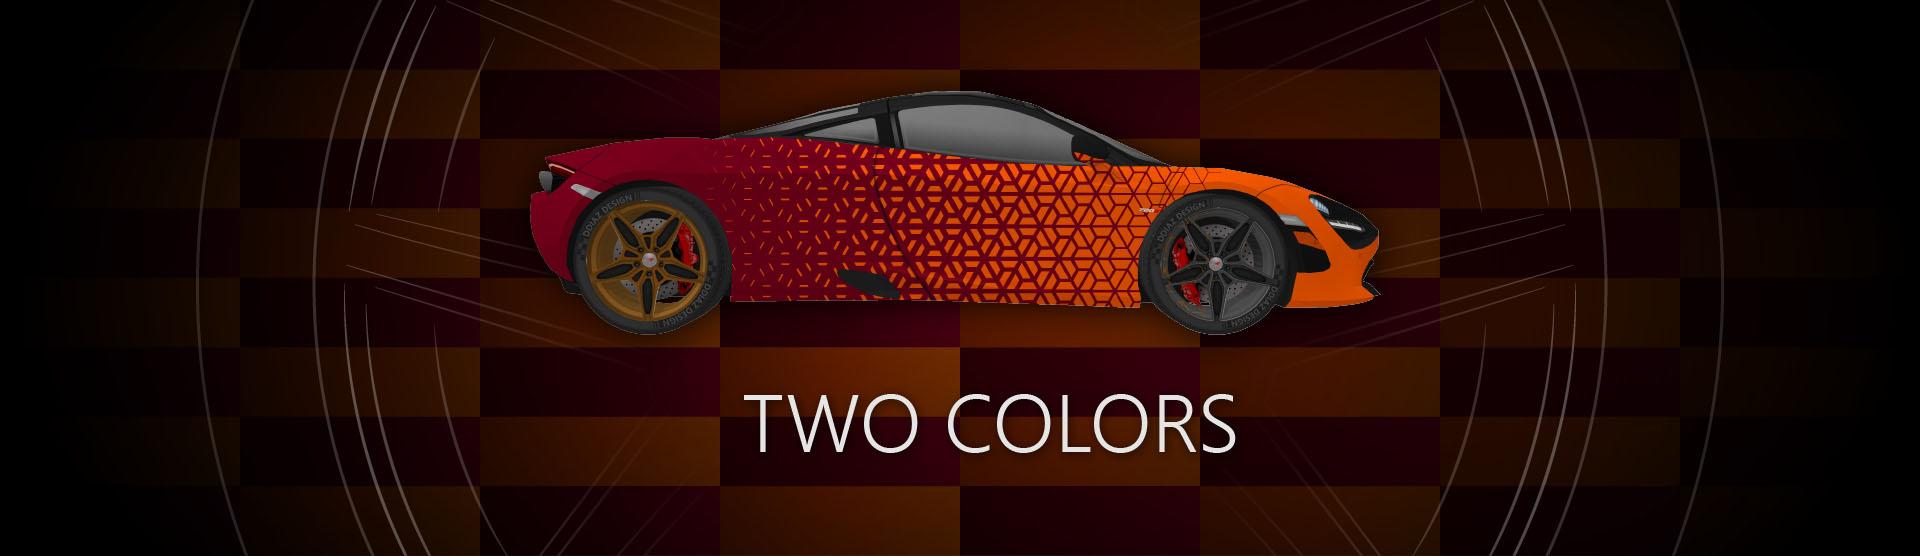 720S Download Colors